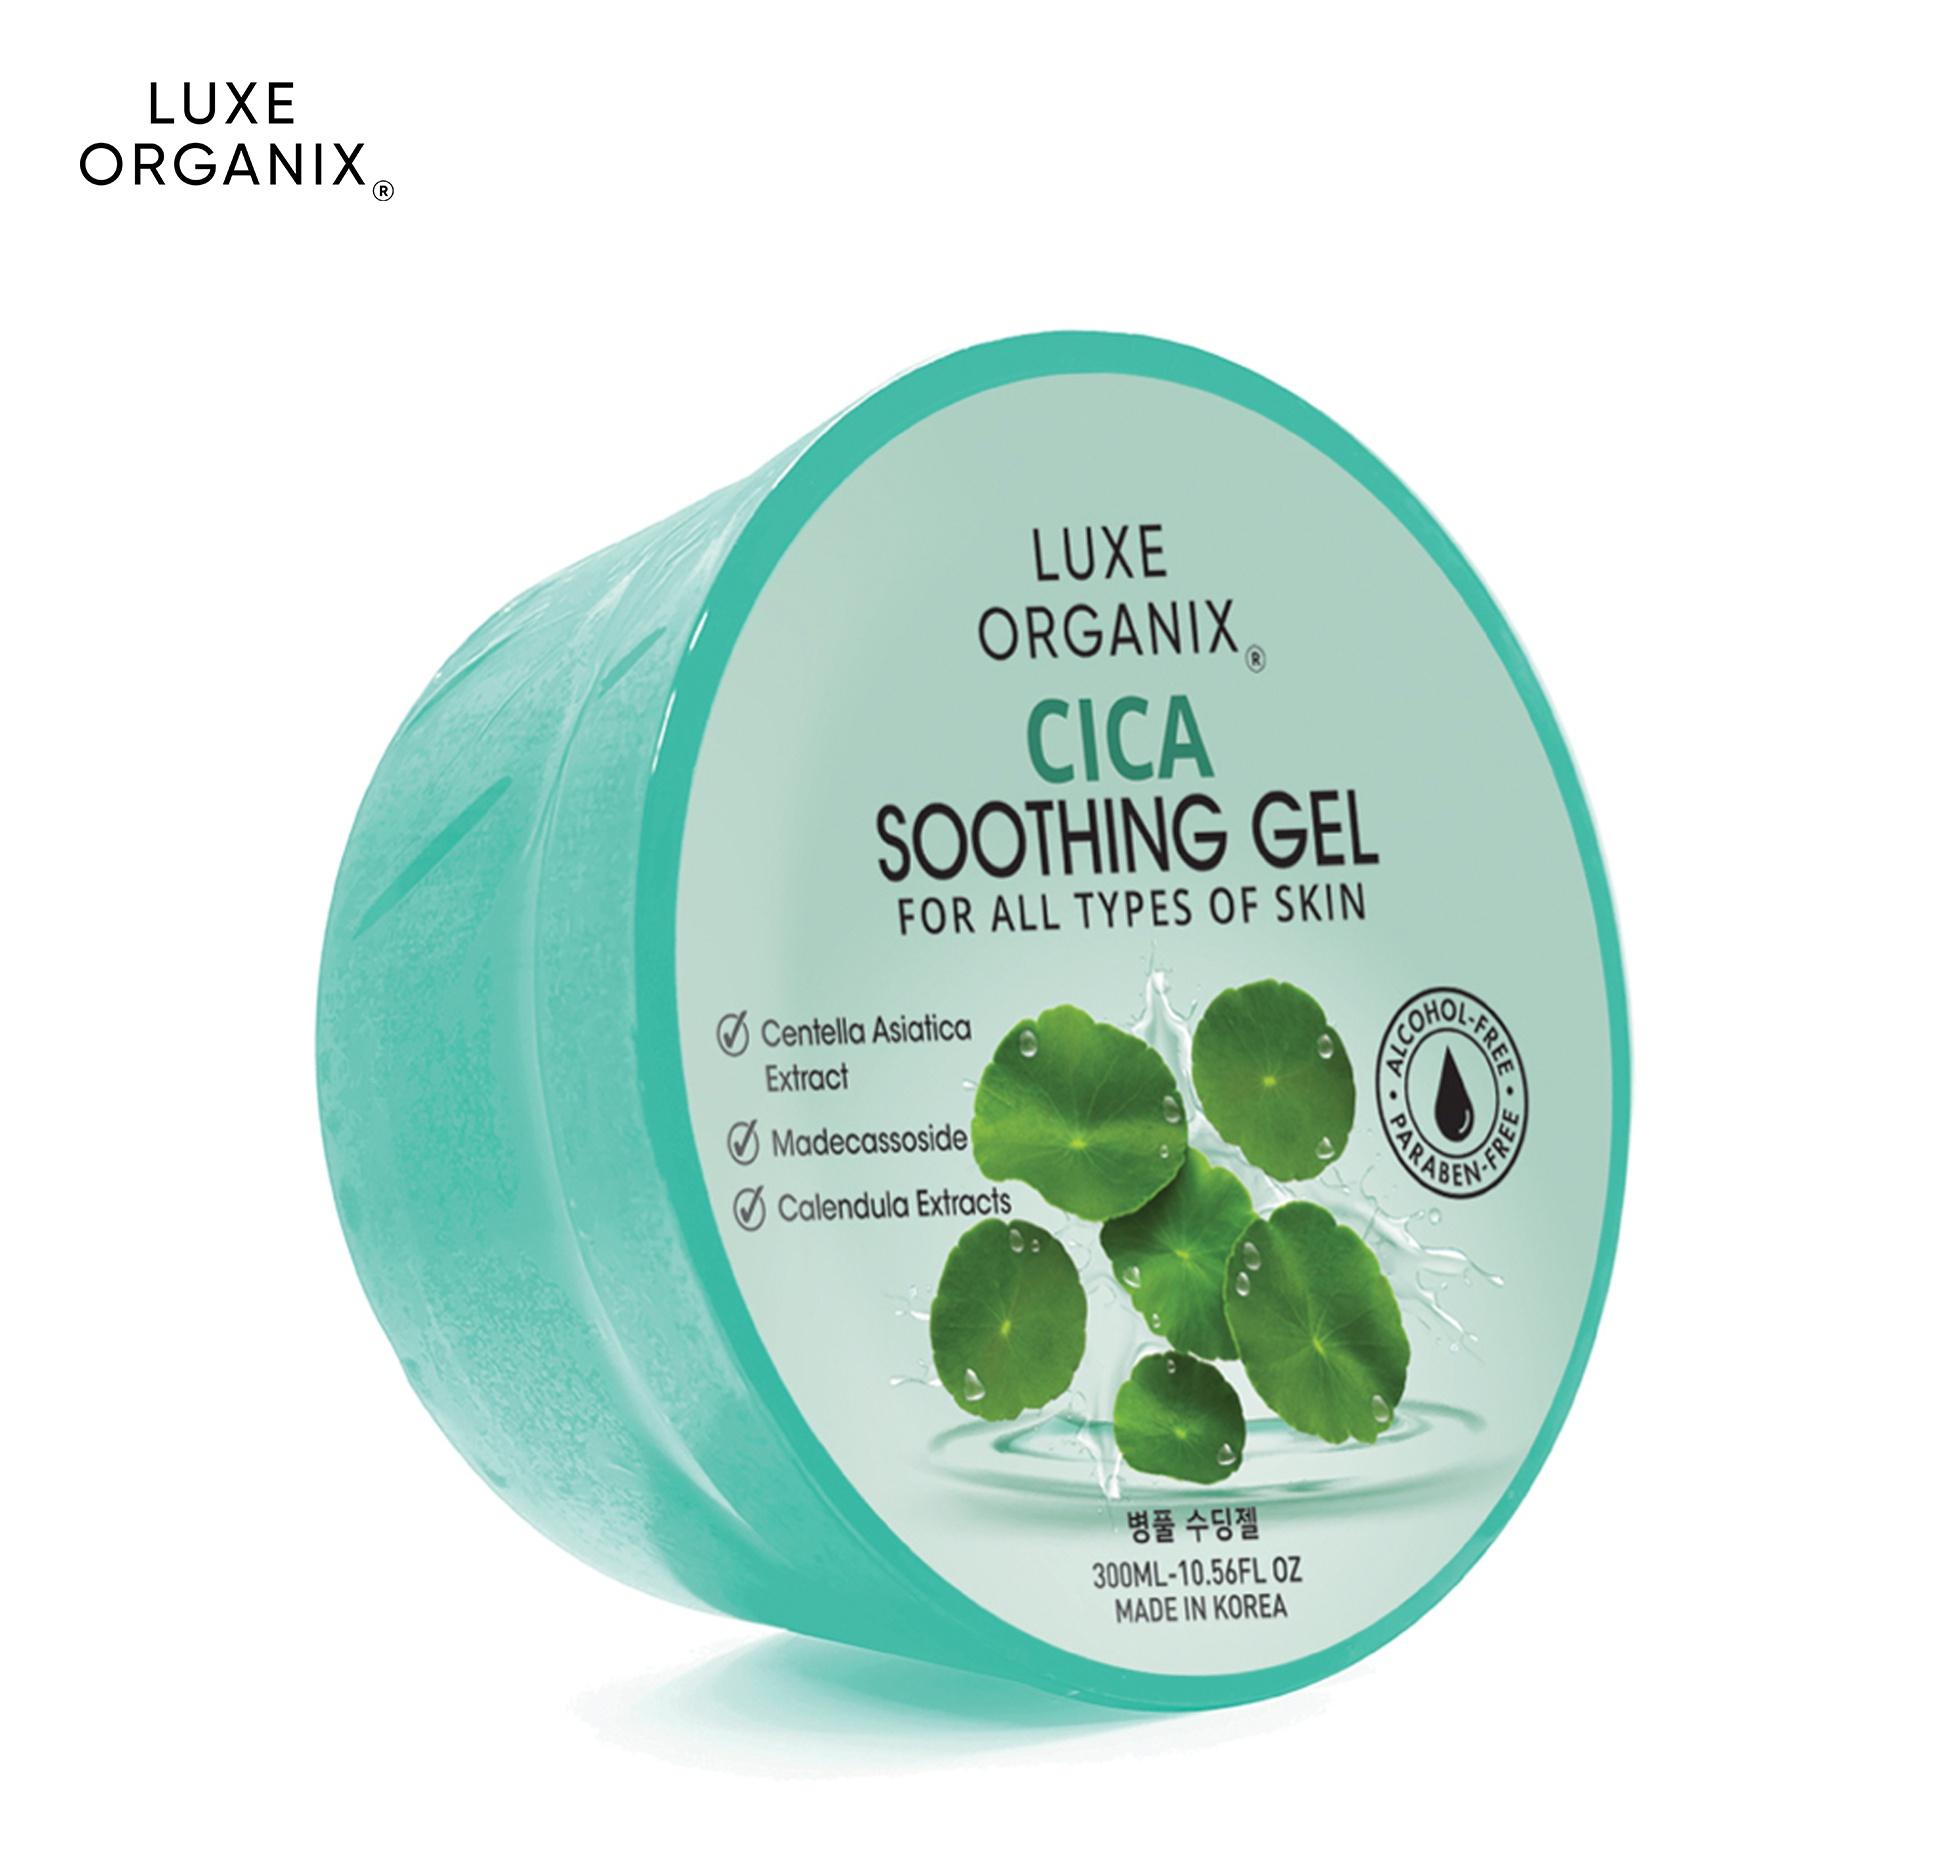 Luxe Organix Cica Soothing Gel